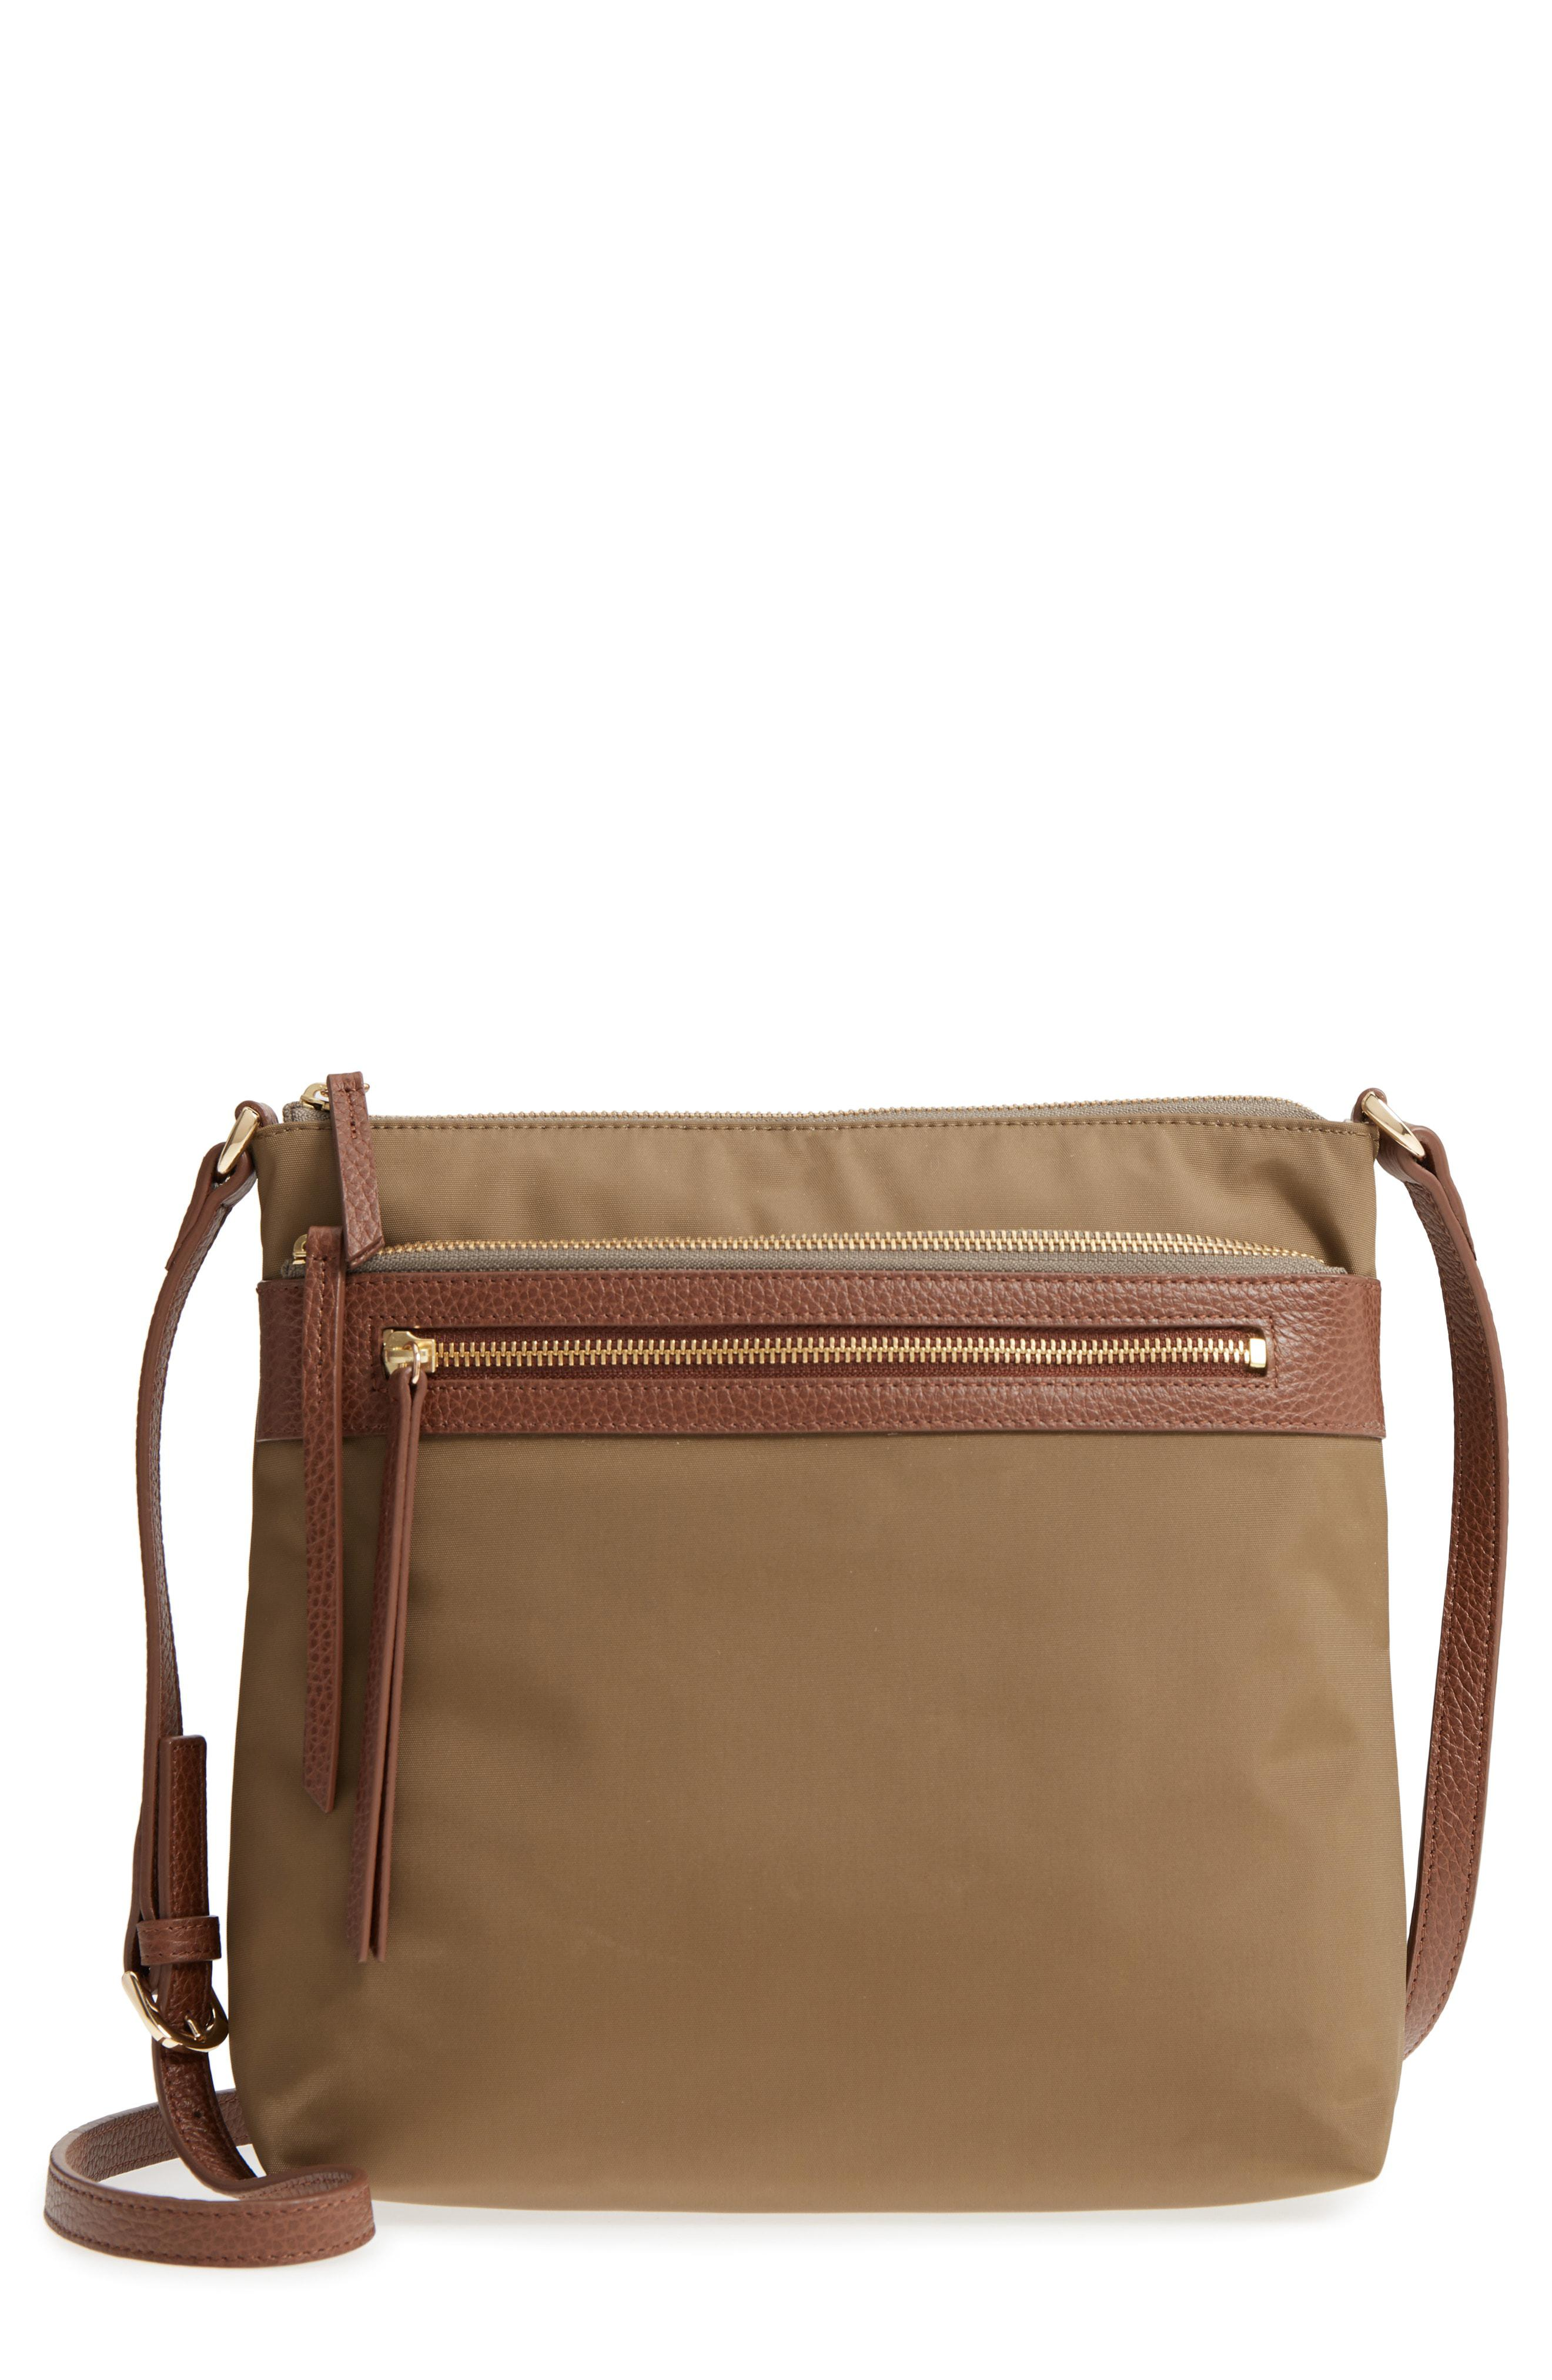 9fec106a99fb Lyst - Nordstrom Kaison Nylon Crossbody Bag in Brown